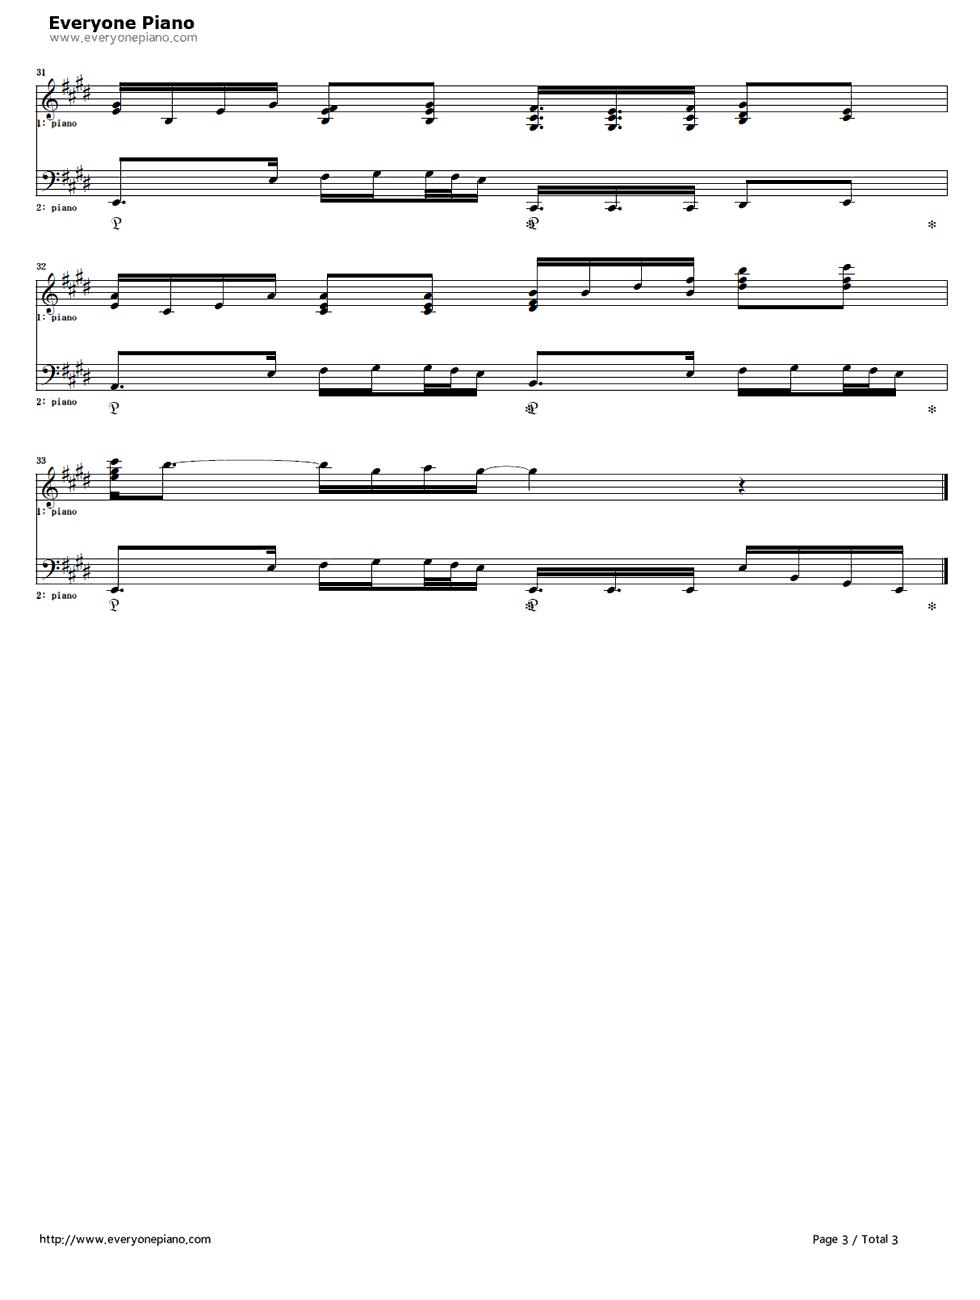 erekutorikku rabu electric love hatsune miku stave preview 3 free piano sheet music piano chords. Black Bedroom Furniture Sets. Home Design Ideas